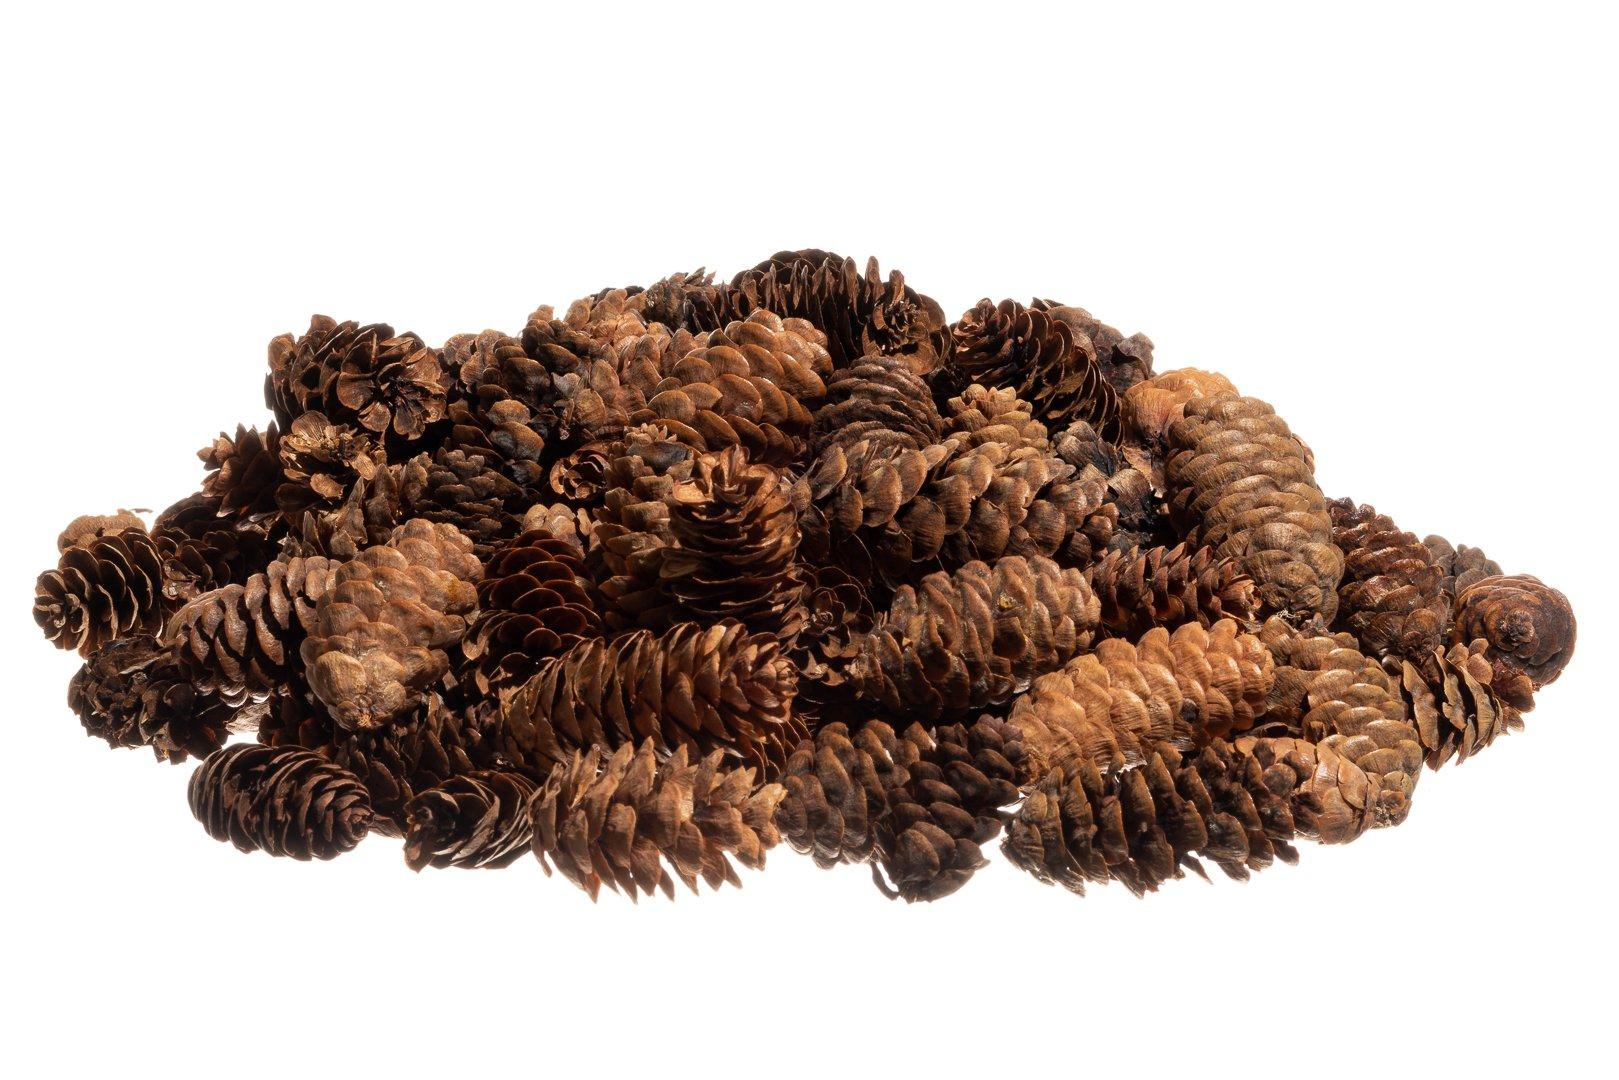 Pine Cones | Small Pine Cones | Mini Black Spruce Pine Cones | Pine Cone Filler (24 oz.) | Plus Free Nautical Ebook by Joseph Rains